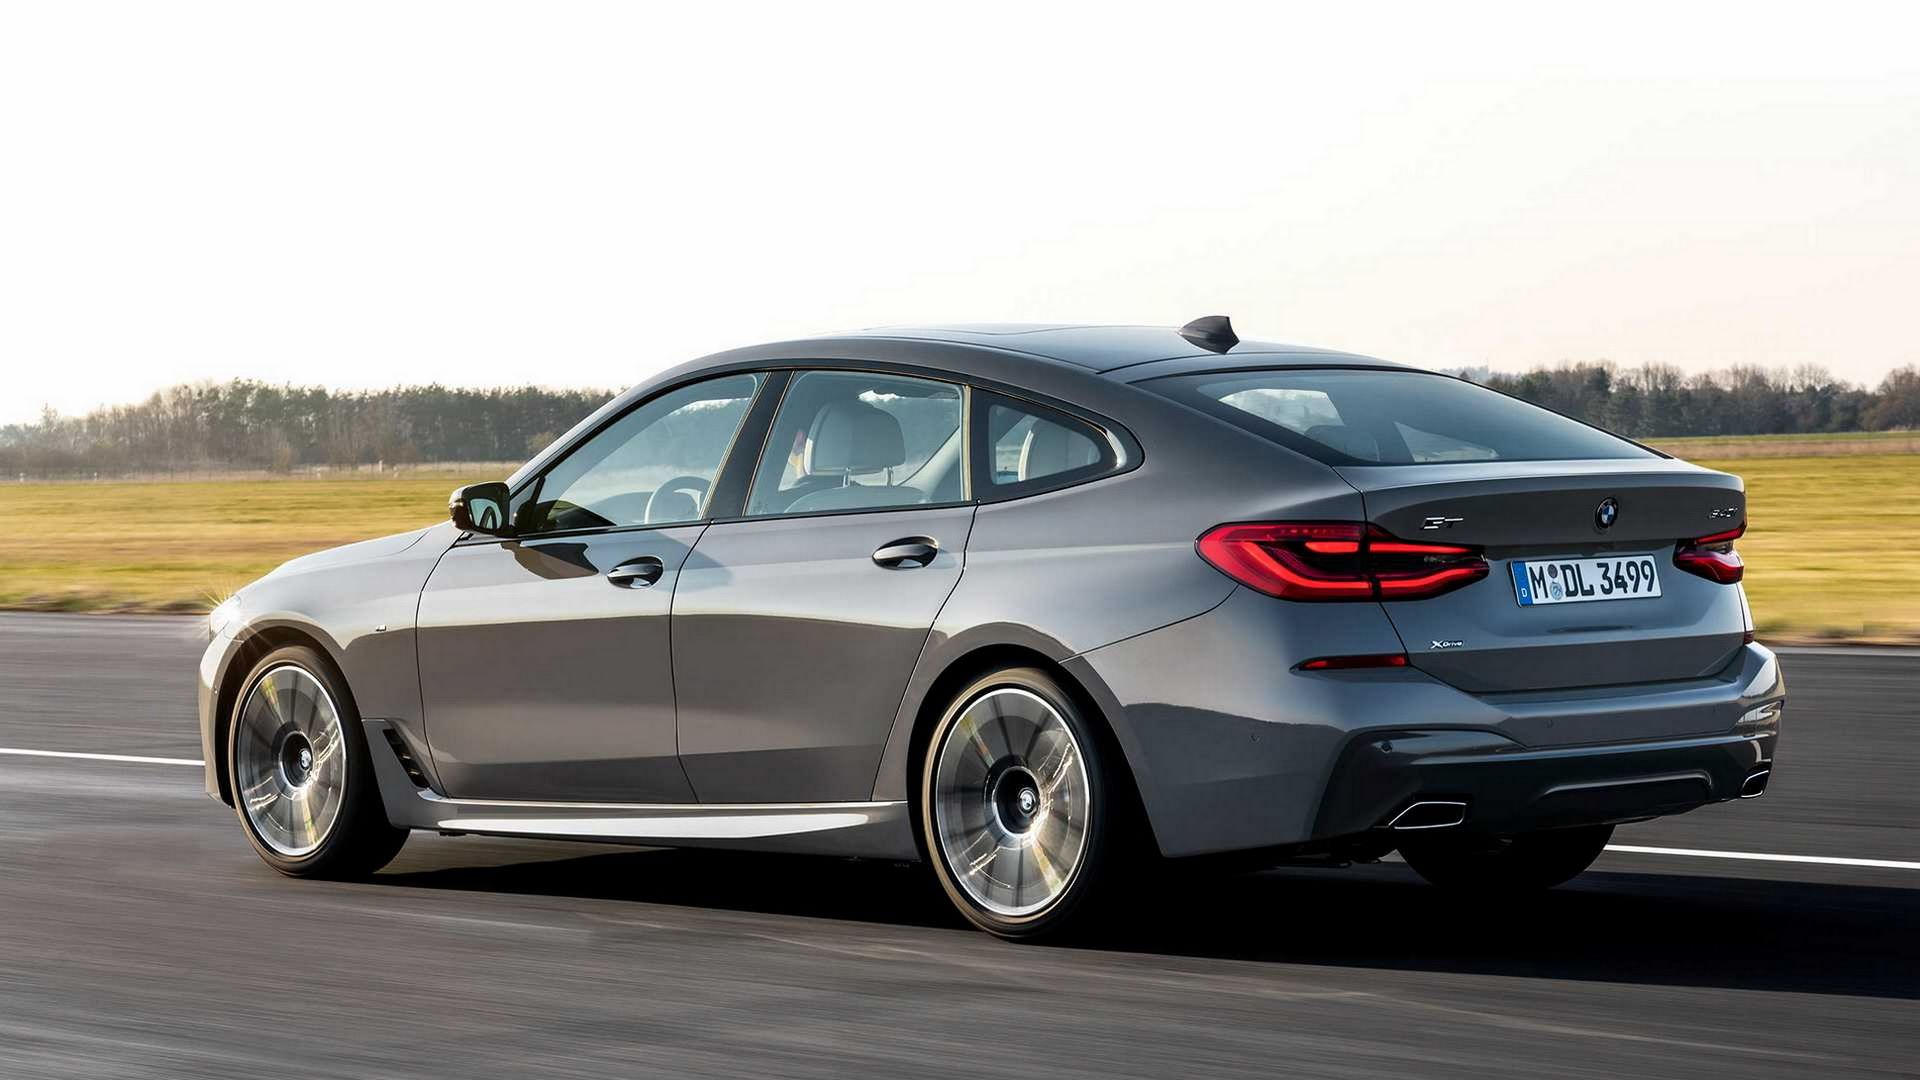 BMW-6-Series-GT-Gran-Turismo-facelift-2021-6